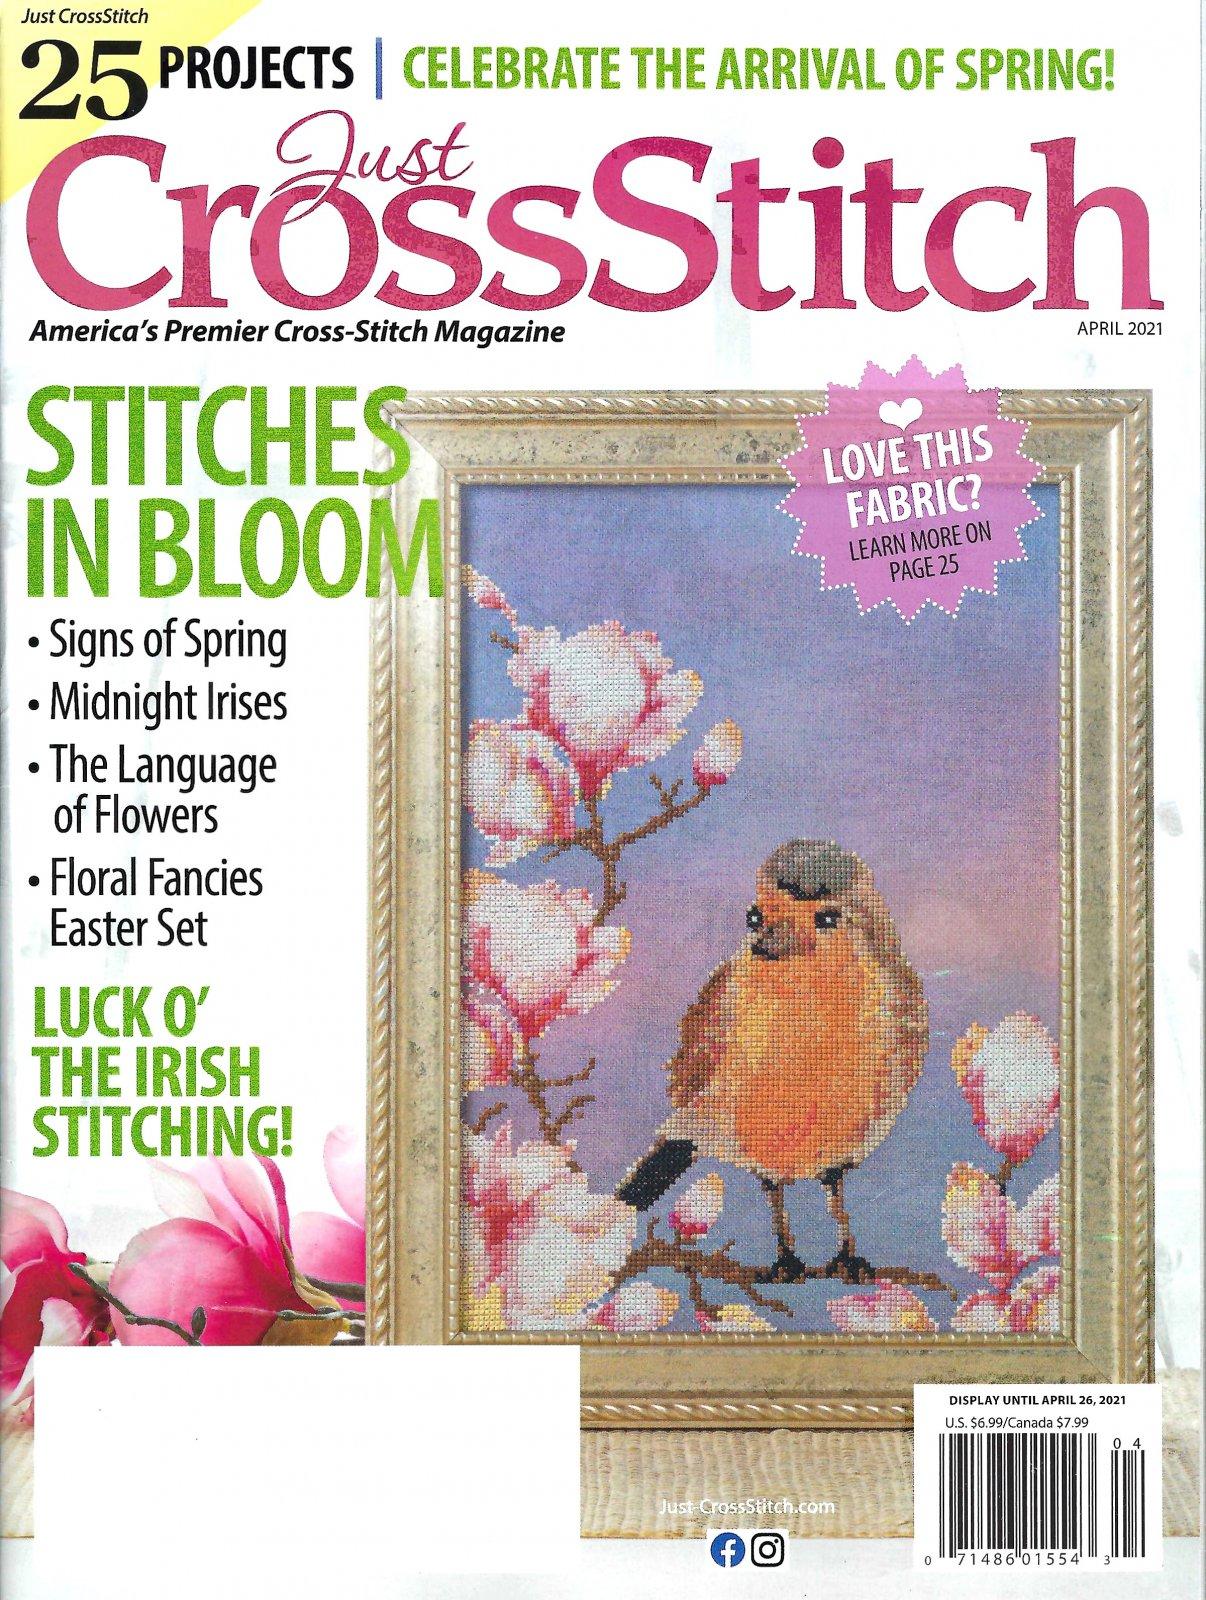 Just CrossStitch Magazines